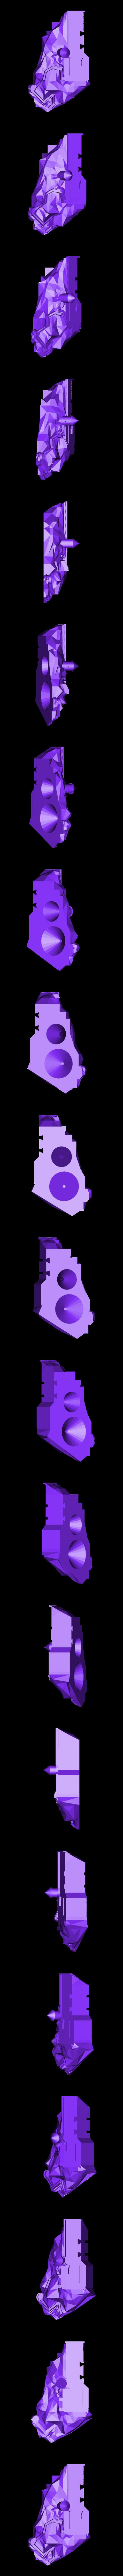 Great Hall Bedrock.stl Download free STL file Hogwarts School of Witchcraft • 3D printer template, Valient